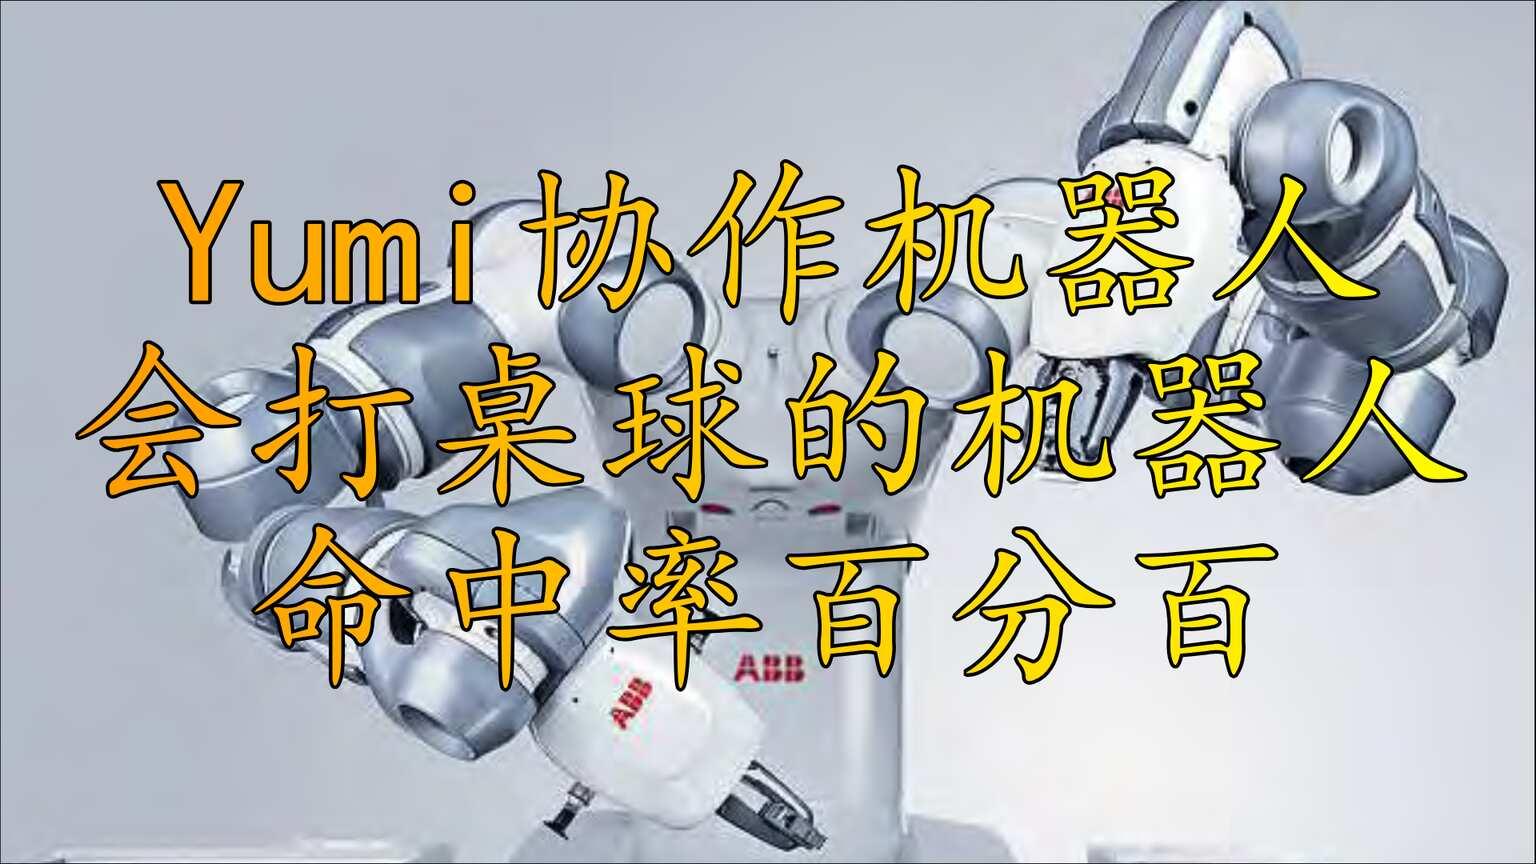 Yumi会打桌球的机器人,命中率百分百